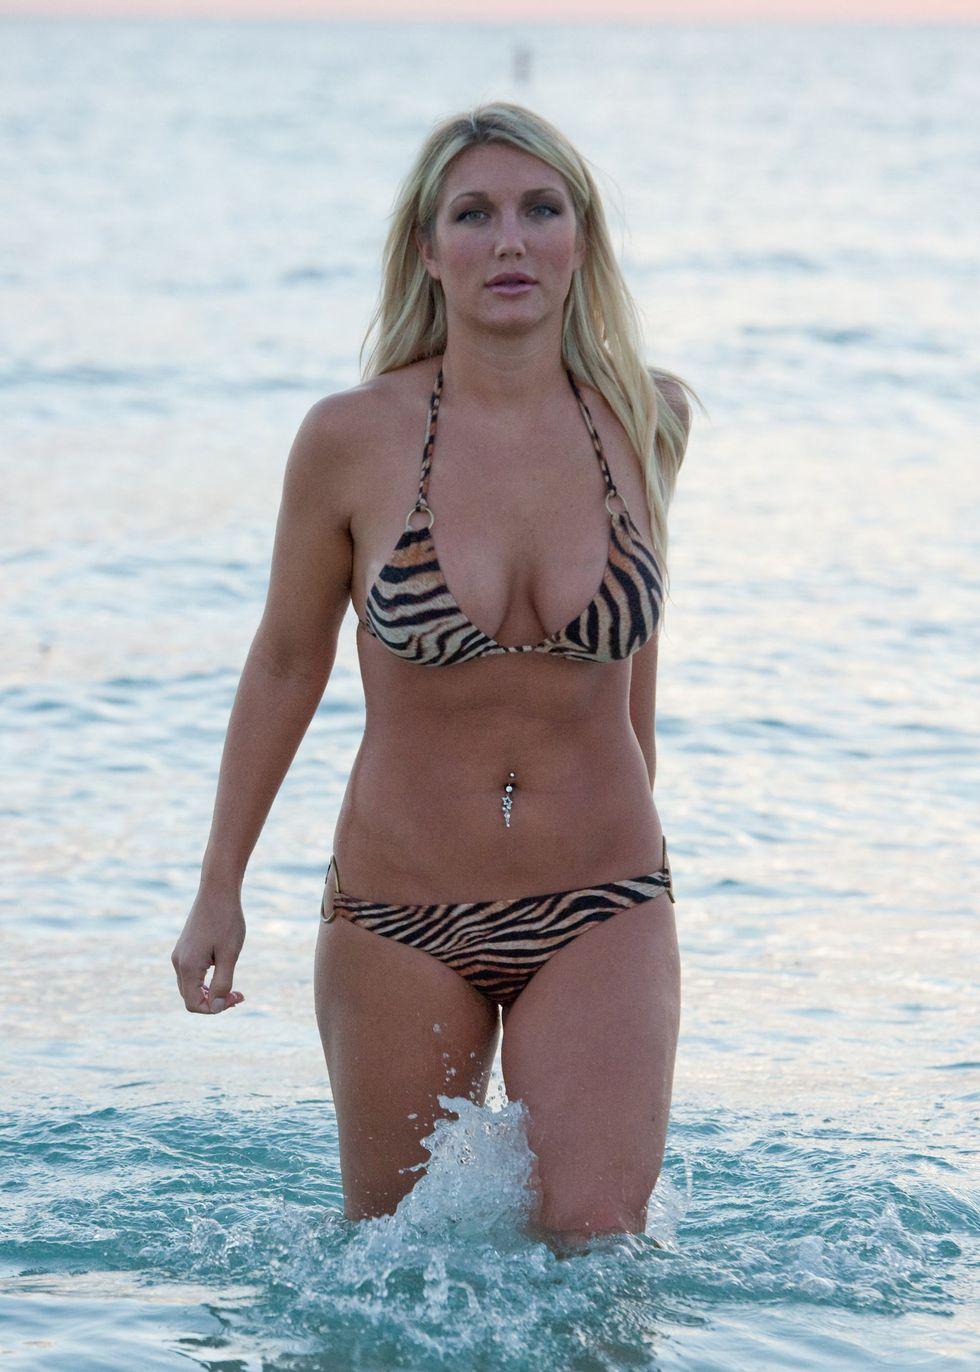 Brooke hogan bikini bulge